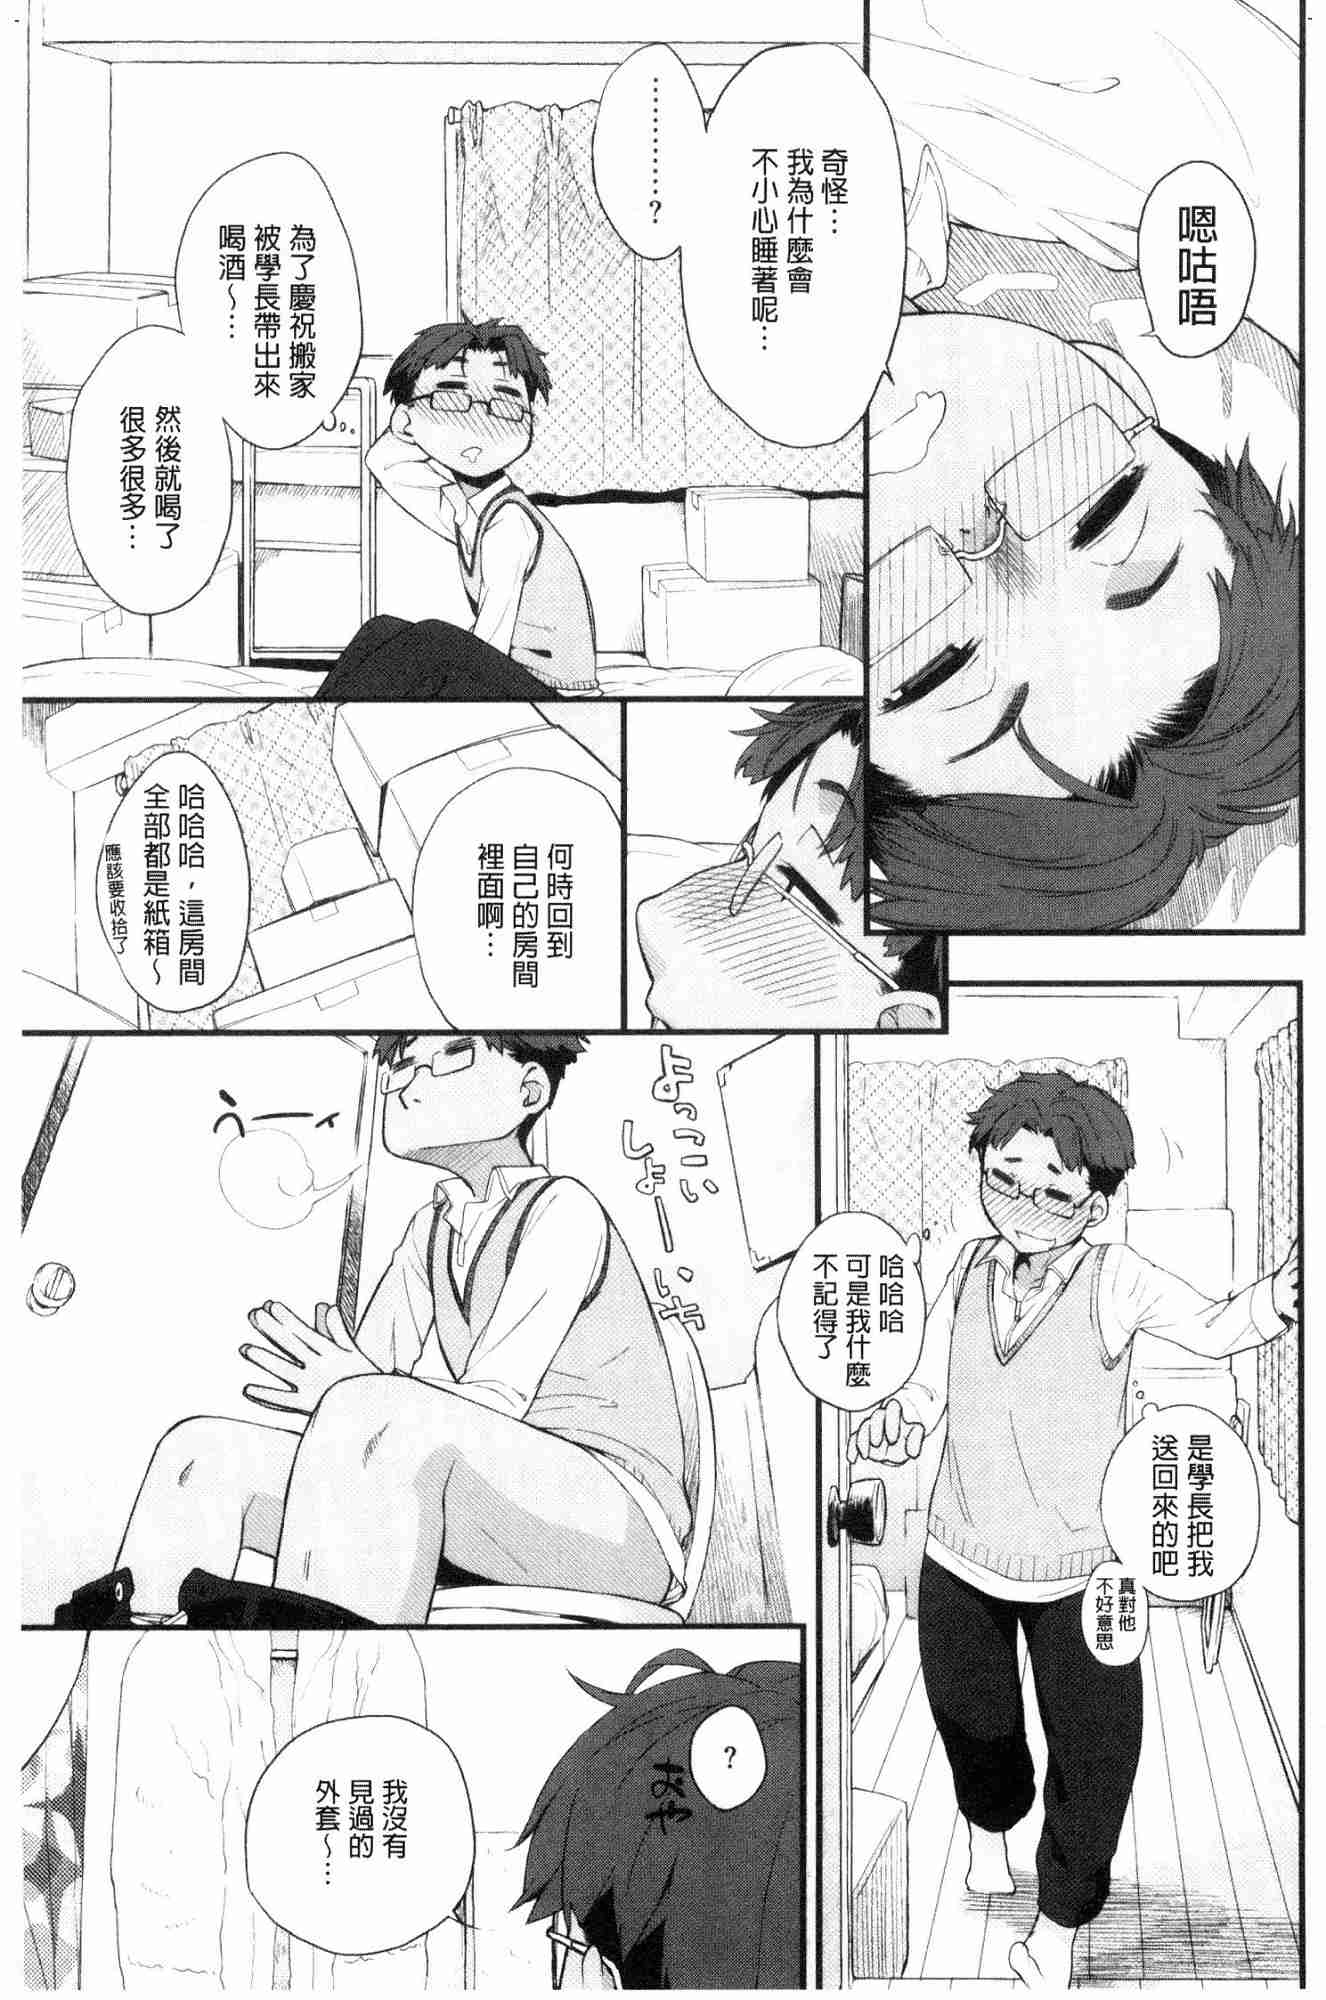 [Ash橫島]_ヲタ子さん(ほか)_御宅子小姐(2_2) - 情色卡漫 -